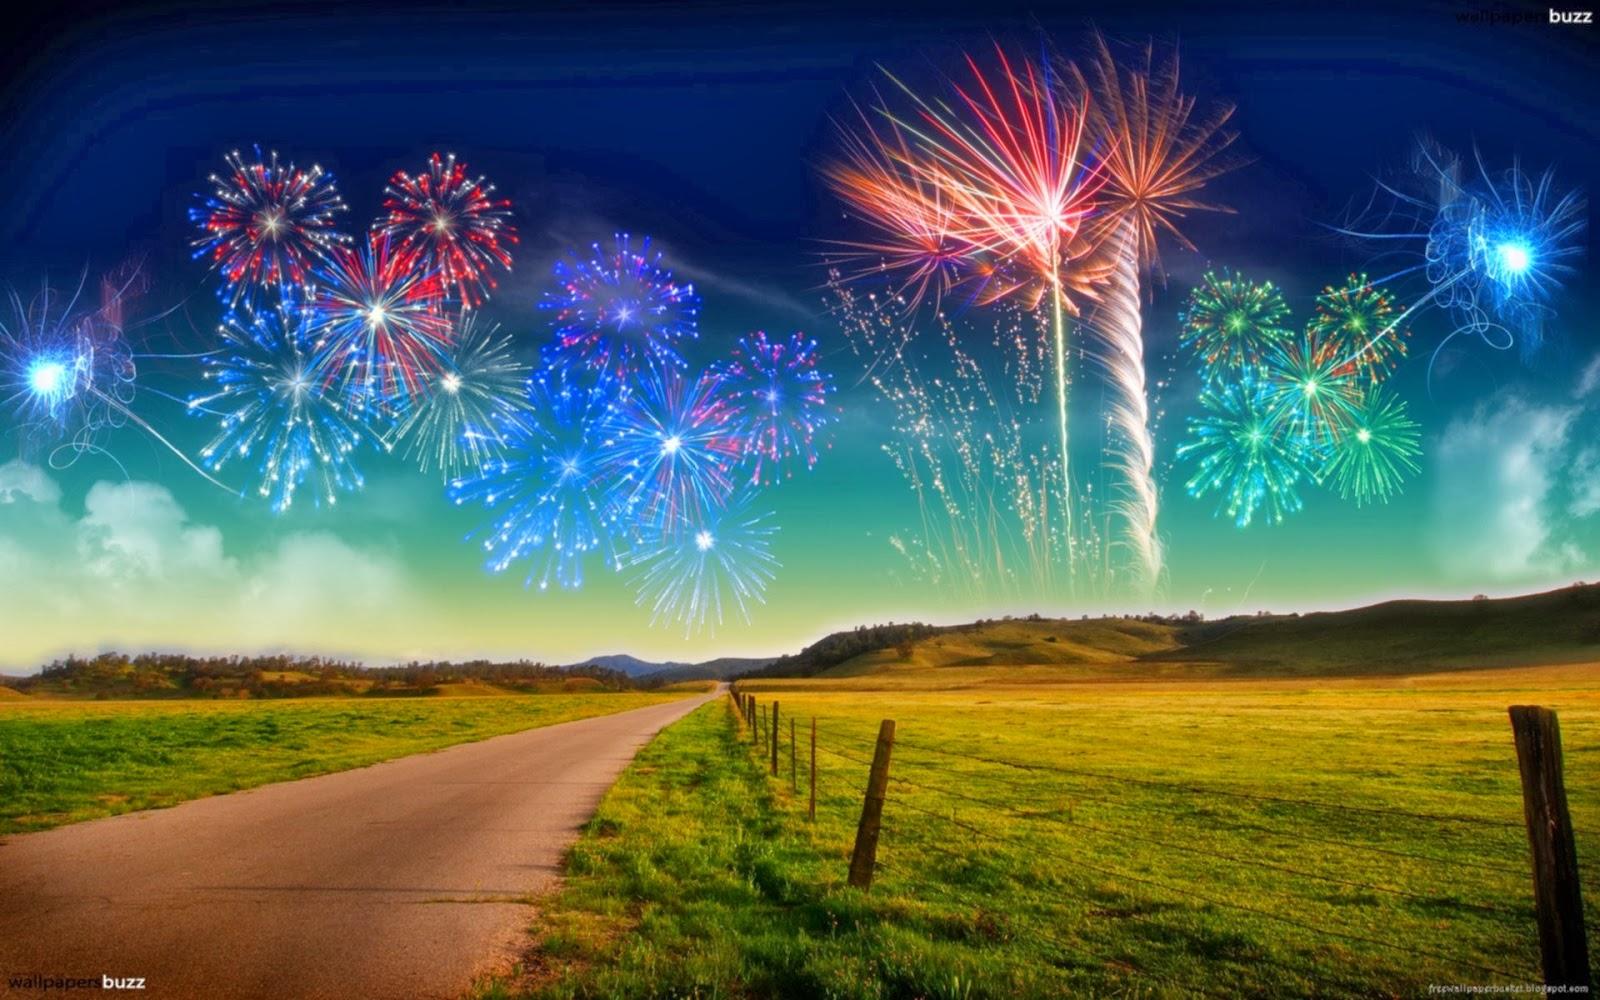 Celebration Background Hd: Majestic Firework For New Year Celebration; Holly